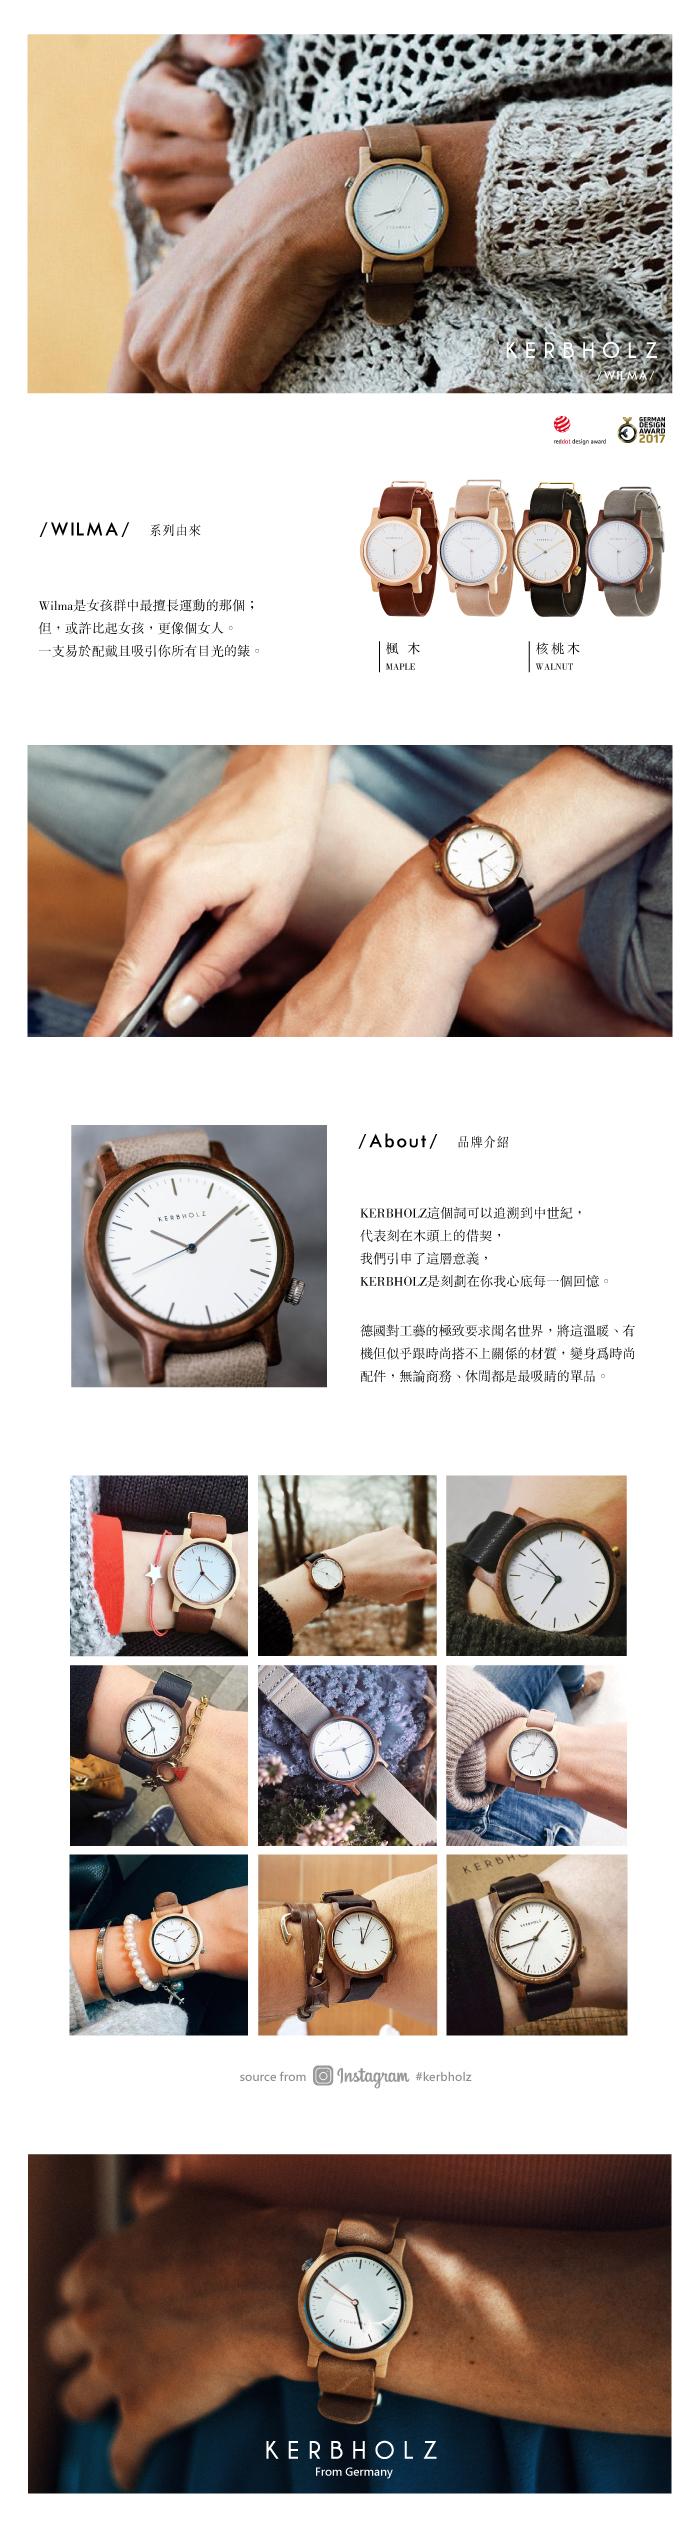 KERBHOLZ|原木手錶 Wilma-楓木 (裸膚/真皮錶帶)